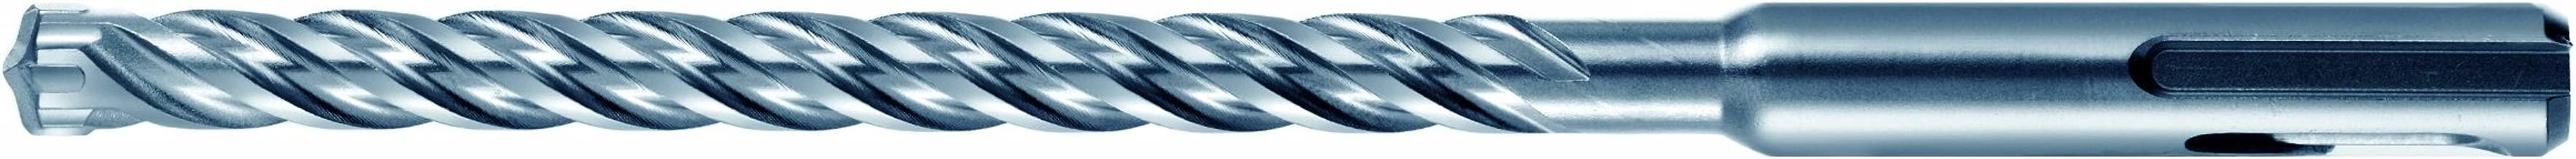 Proline CM12-1 12-Inch Carbide Tipped Masonry Rotary Drill